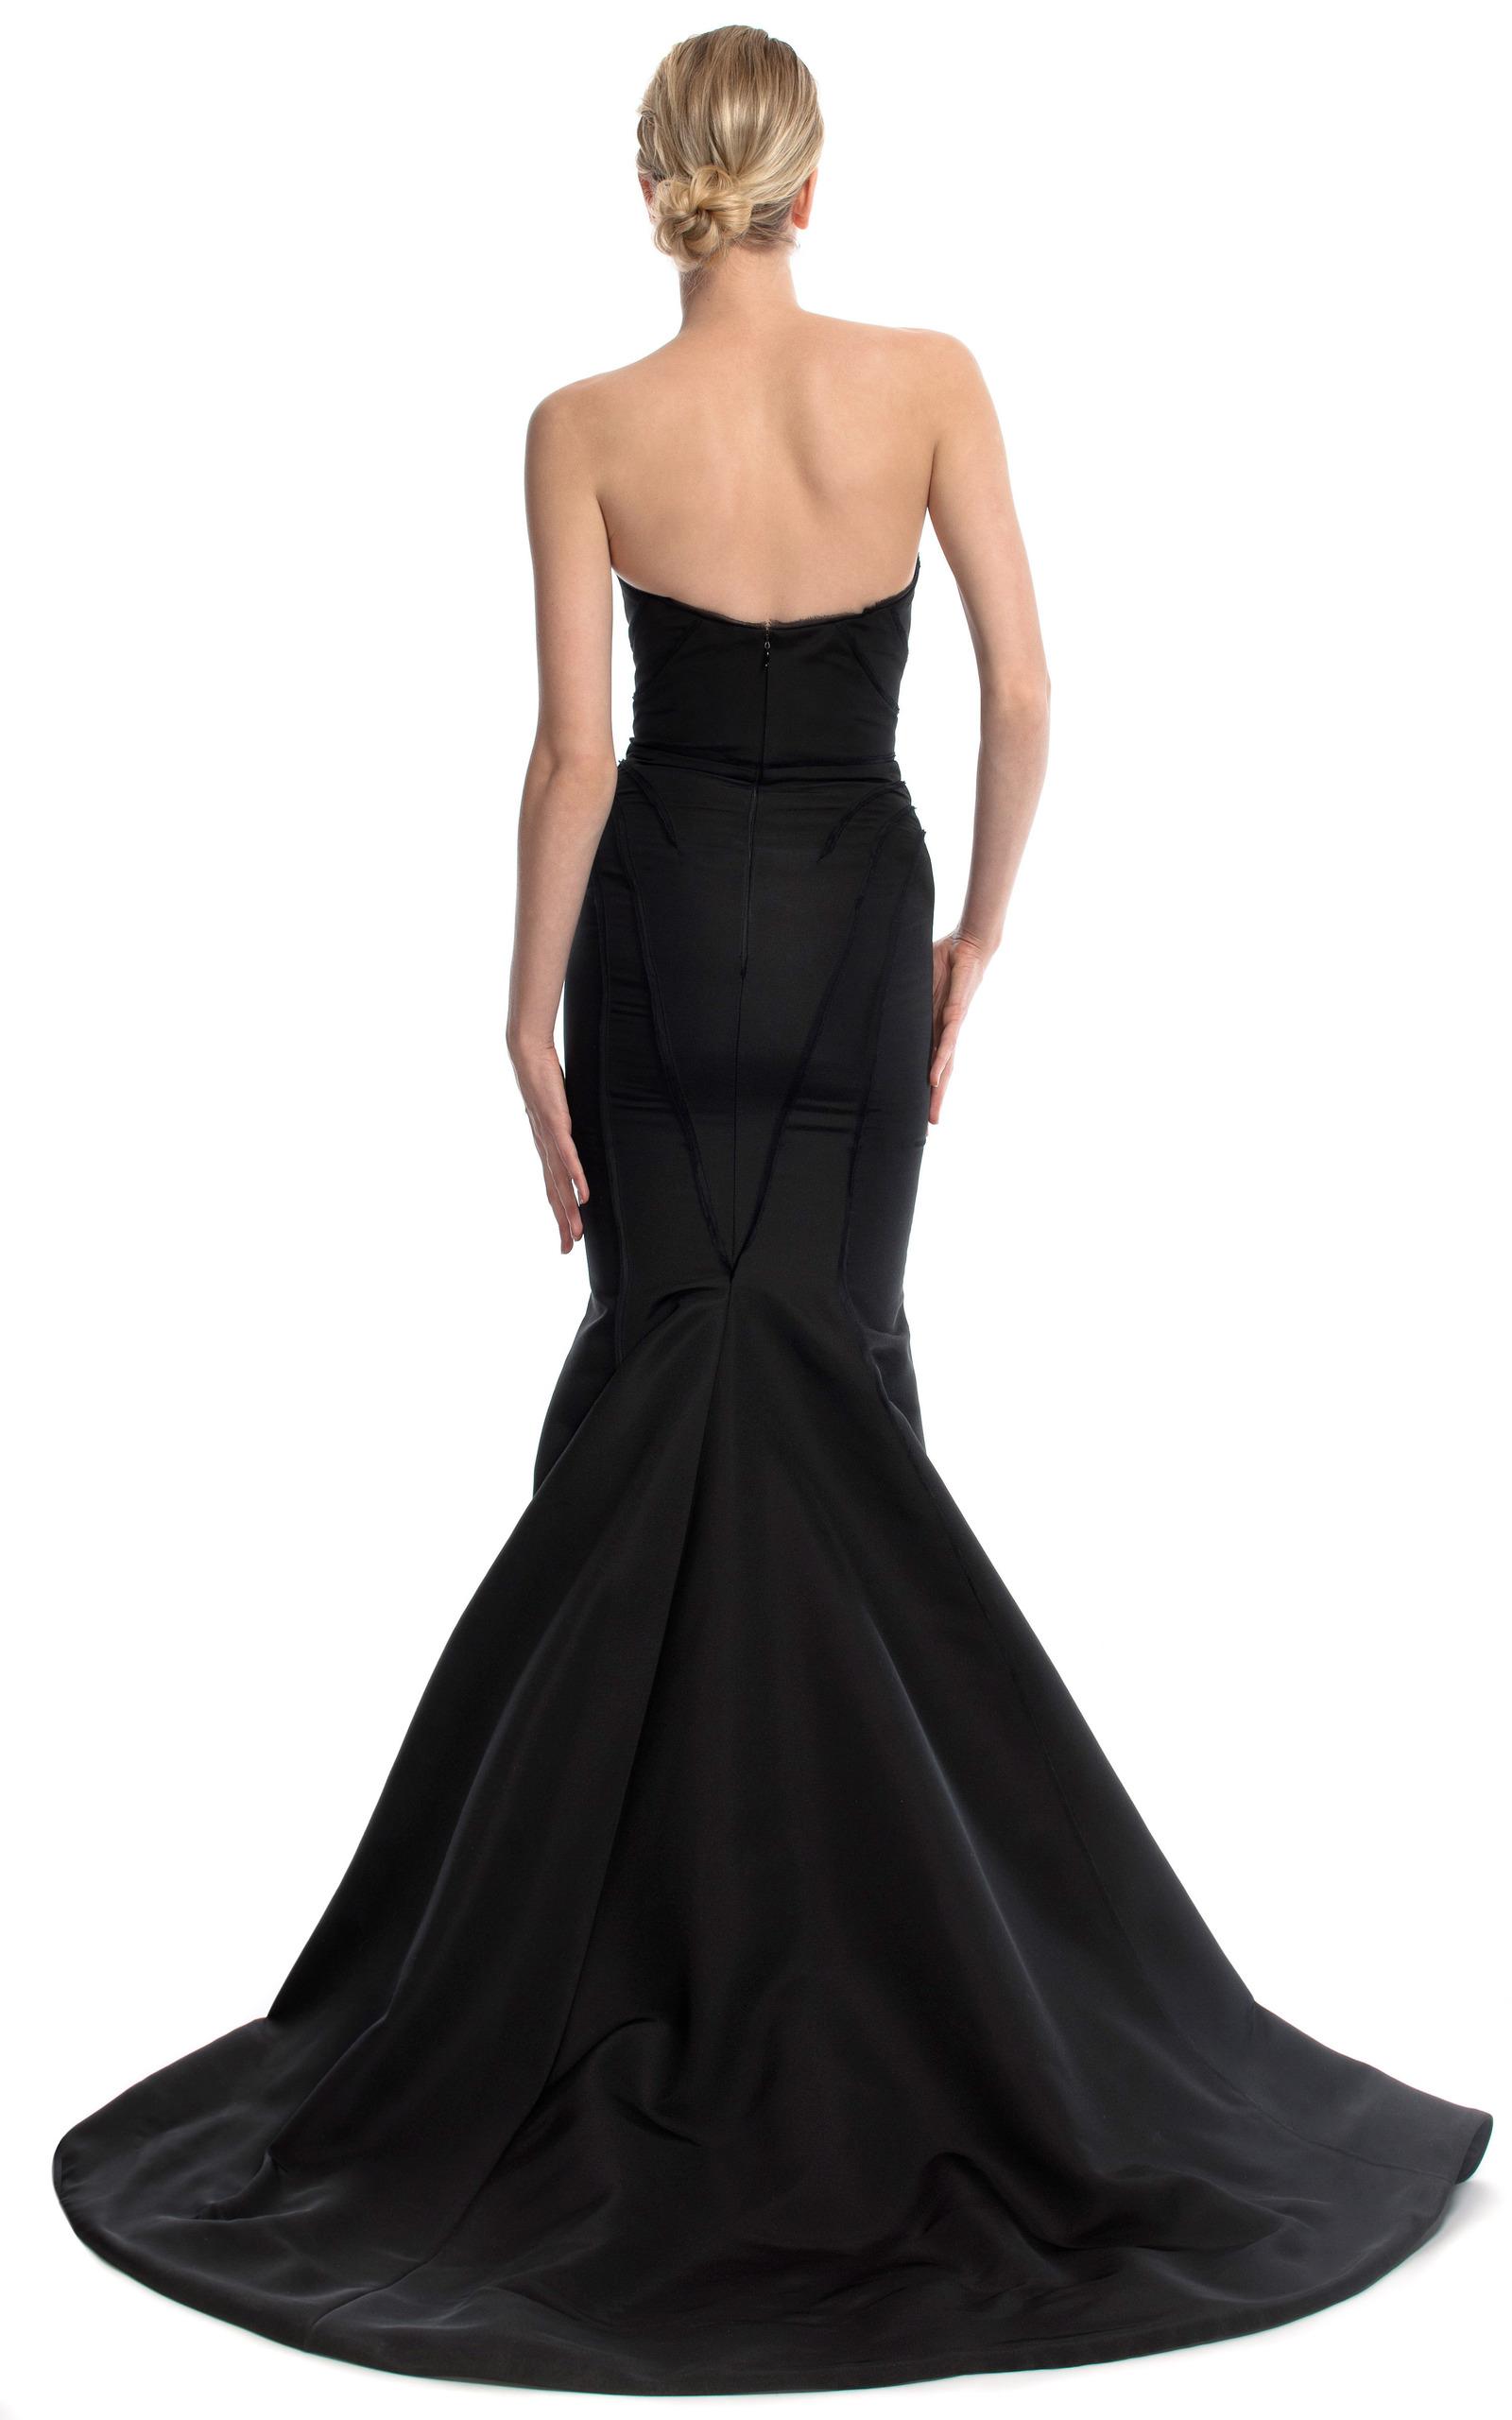 Black Strapless Evening Gown by Zac Posen | Moda Operandi